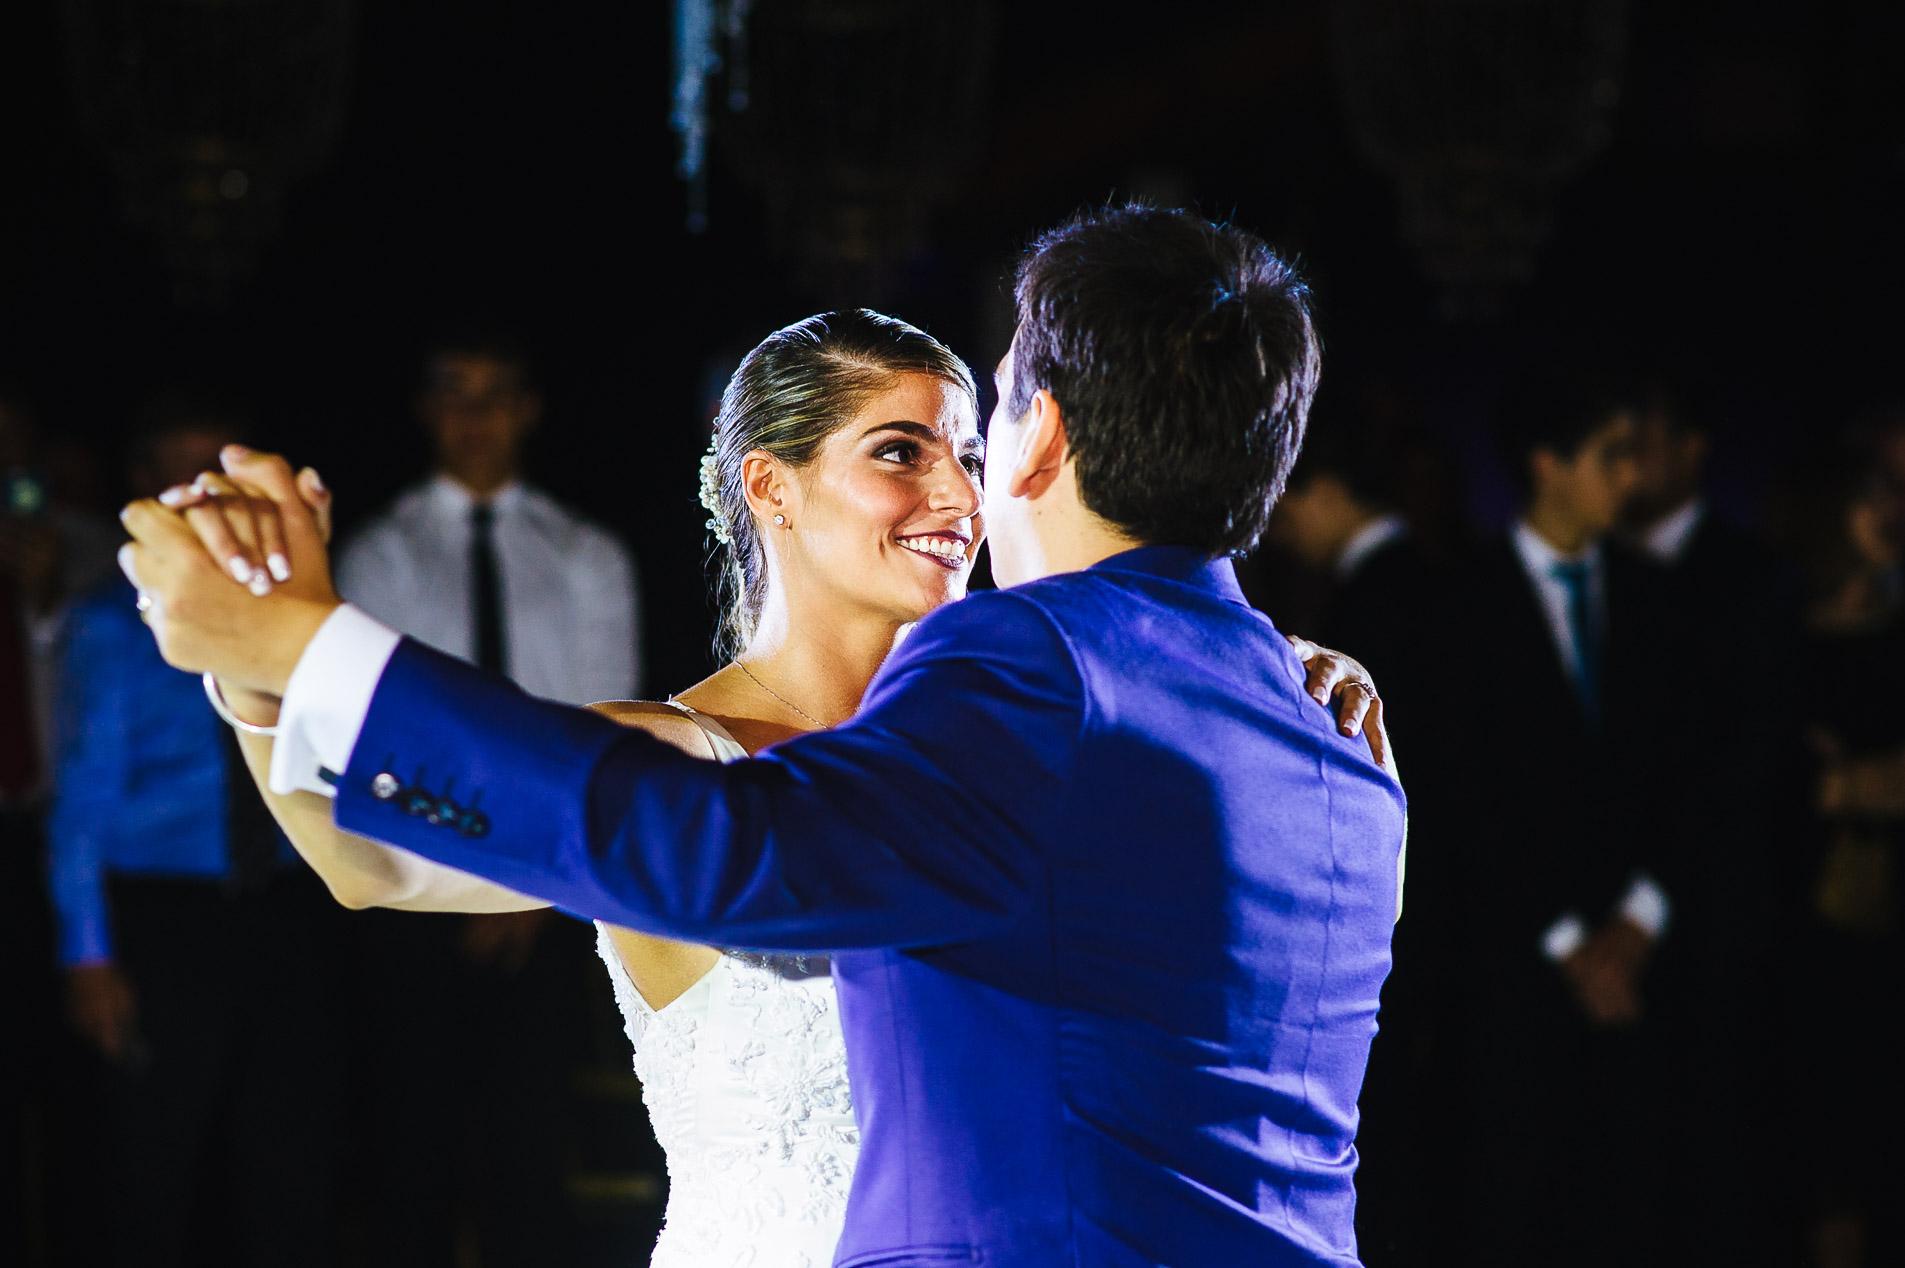 Mariana-Cristian-Fotos-Matrimonio-44